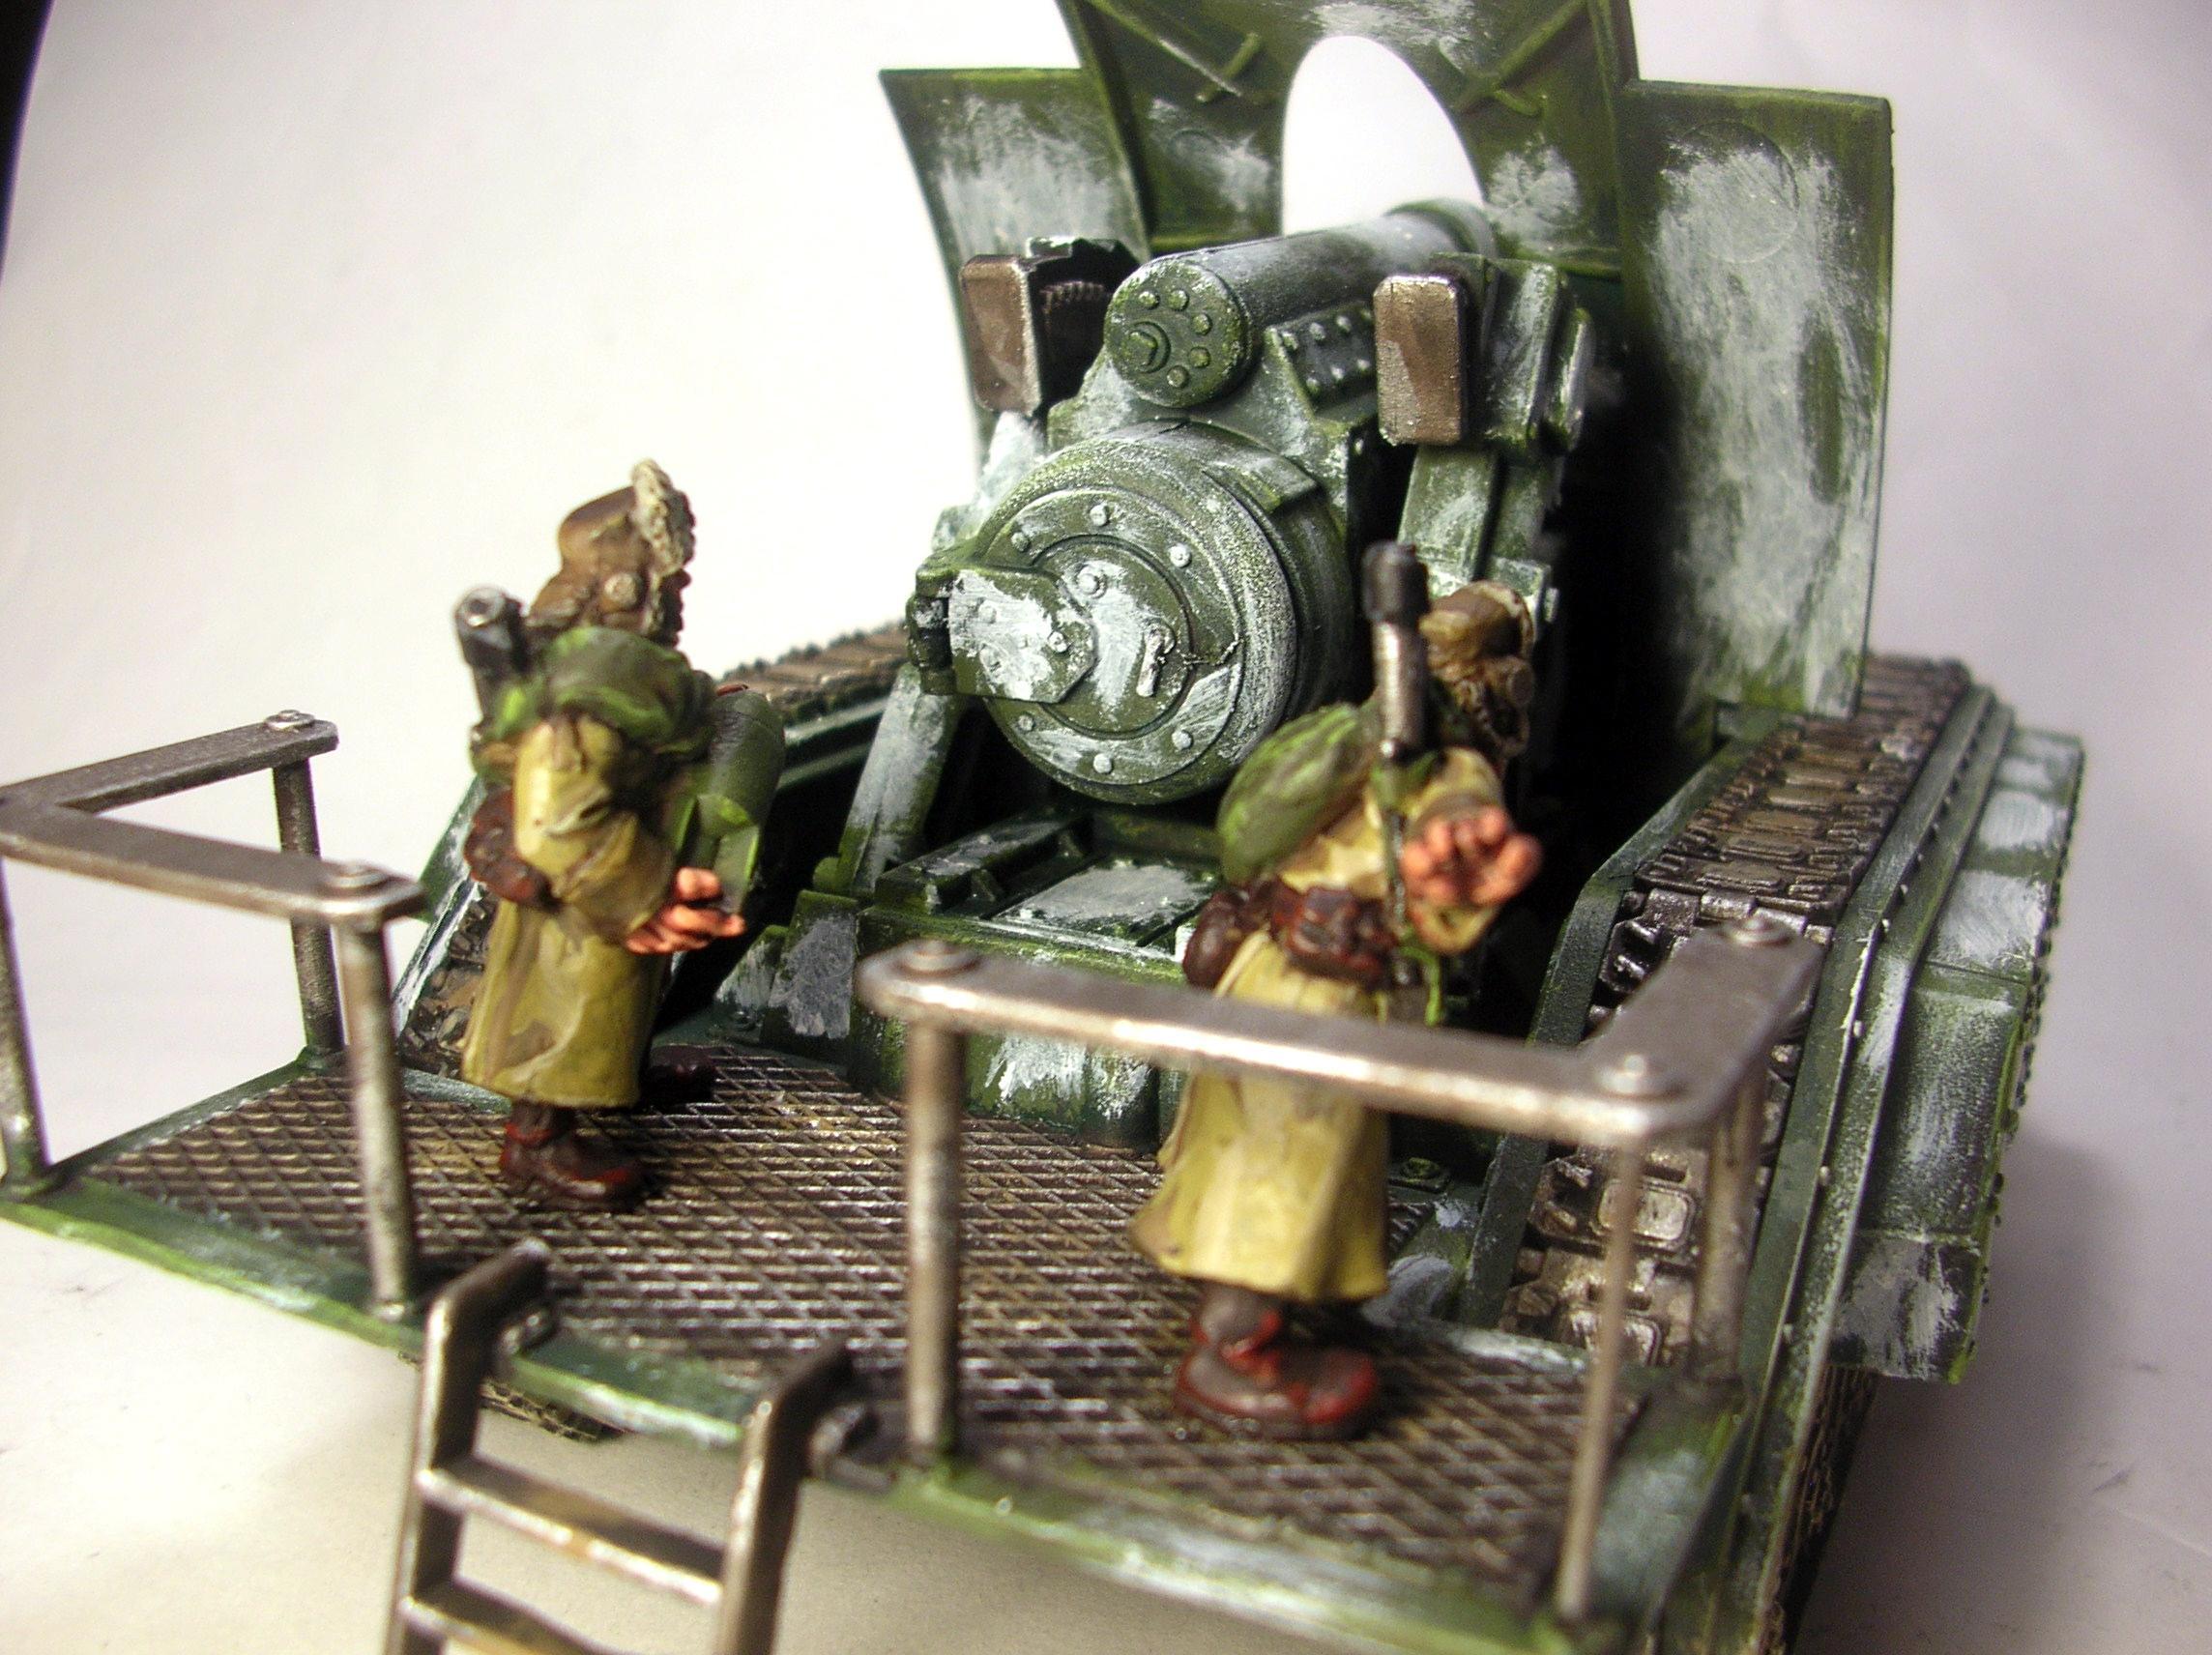 Artillery, Basilisk, Imperial Guard, Russians, Valhallans, Warhammer 40,000